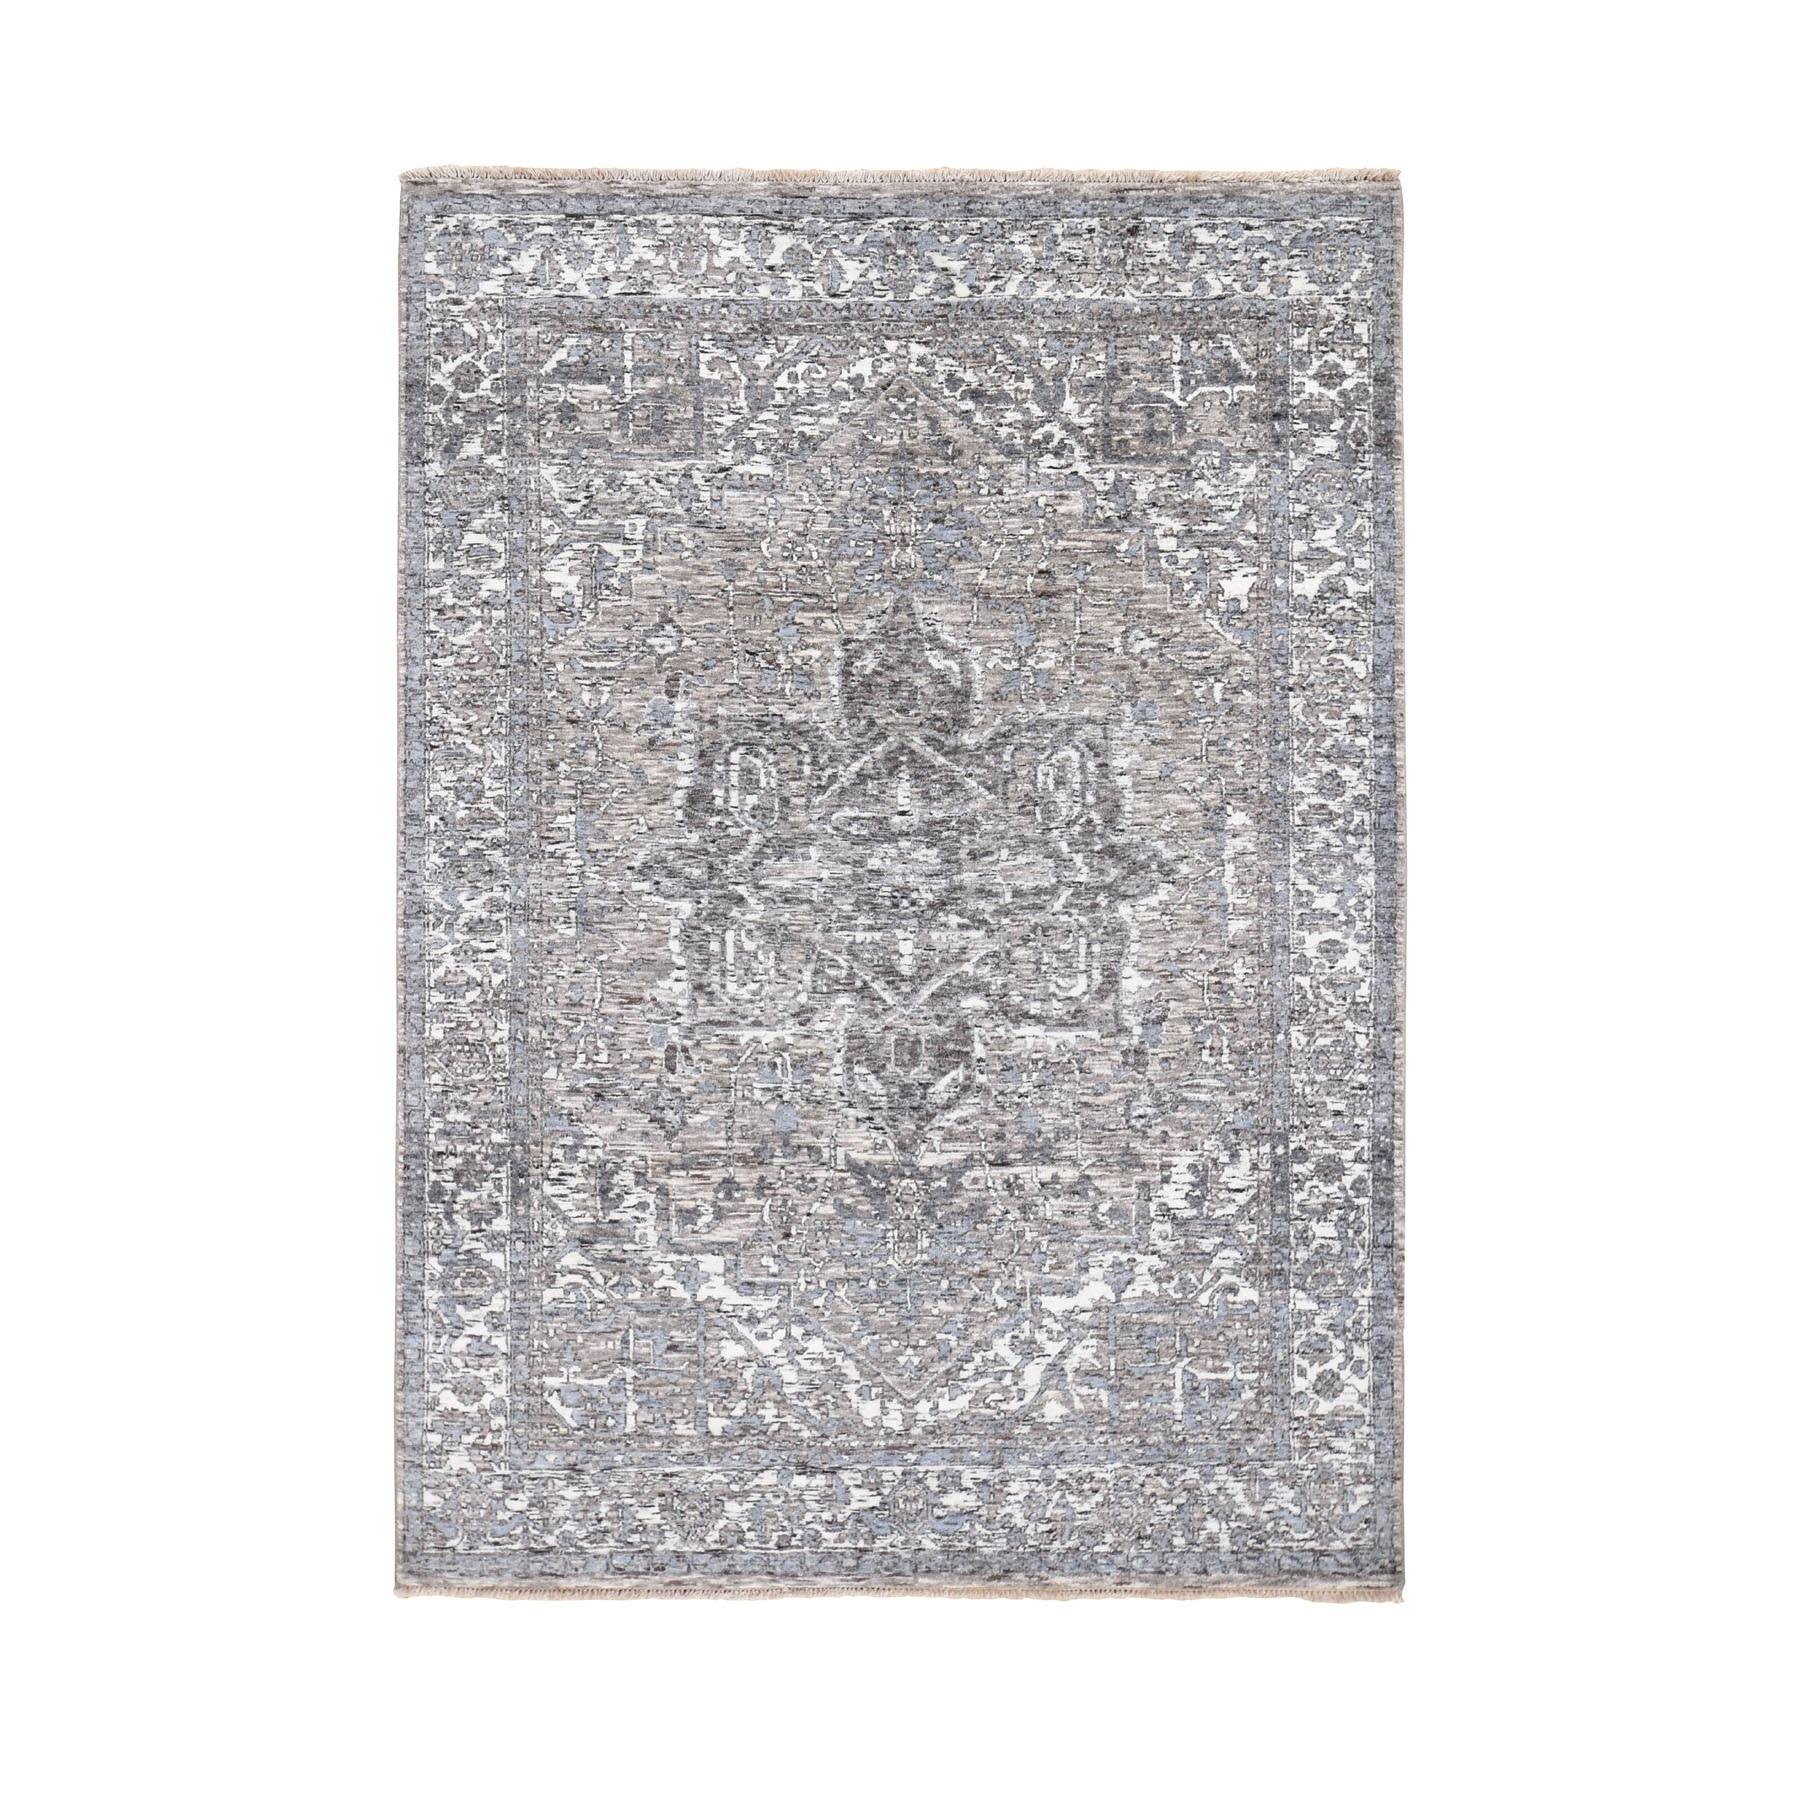 "5'1""x7'2"" Undyed Natural Wool Heriz Design Hand Knotted Oriental Rug"